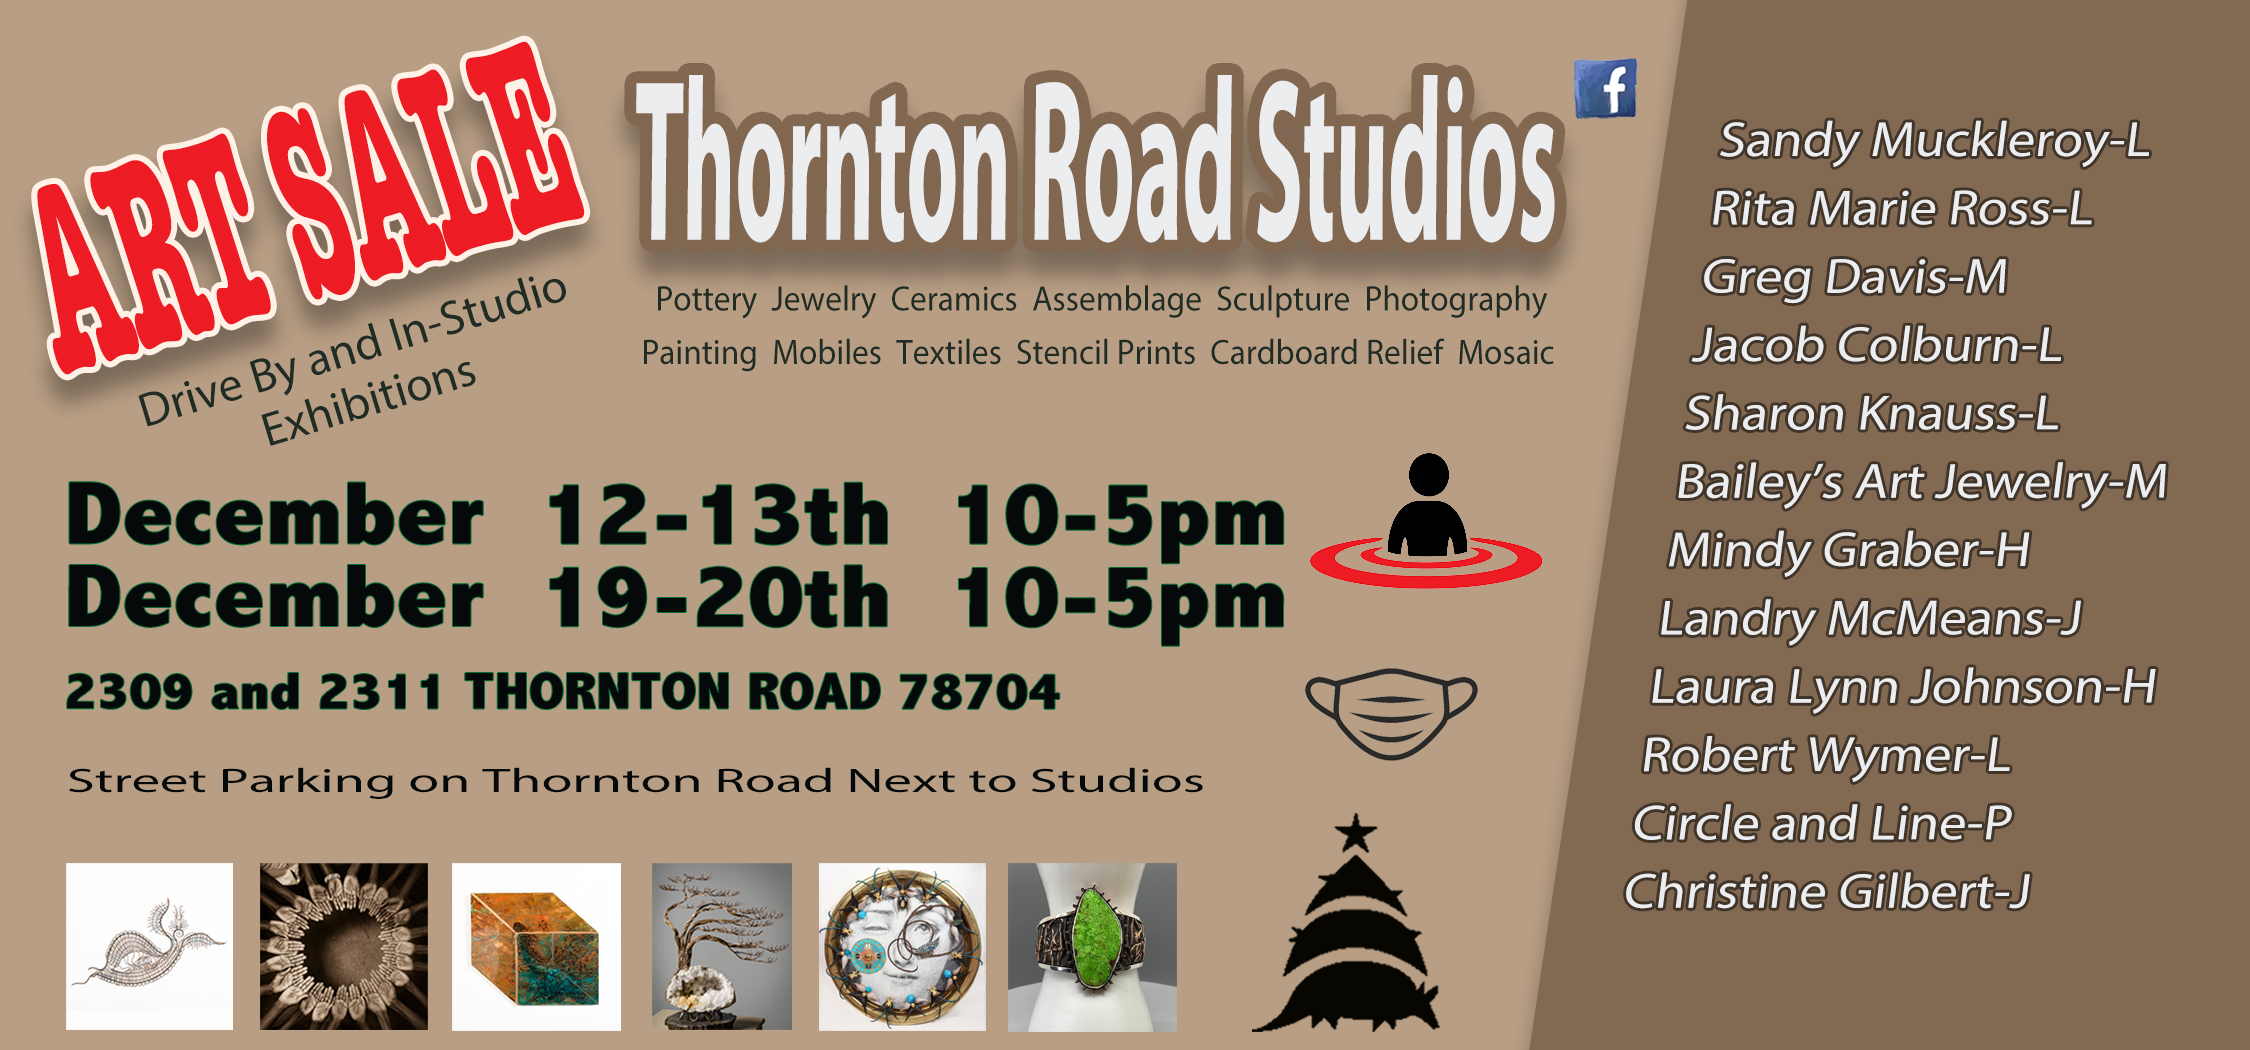 Thornton Road Studios Christmas Art Sale